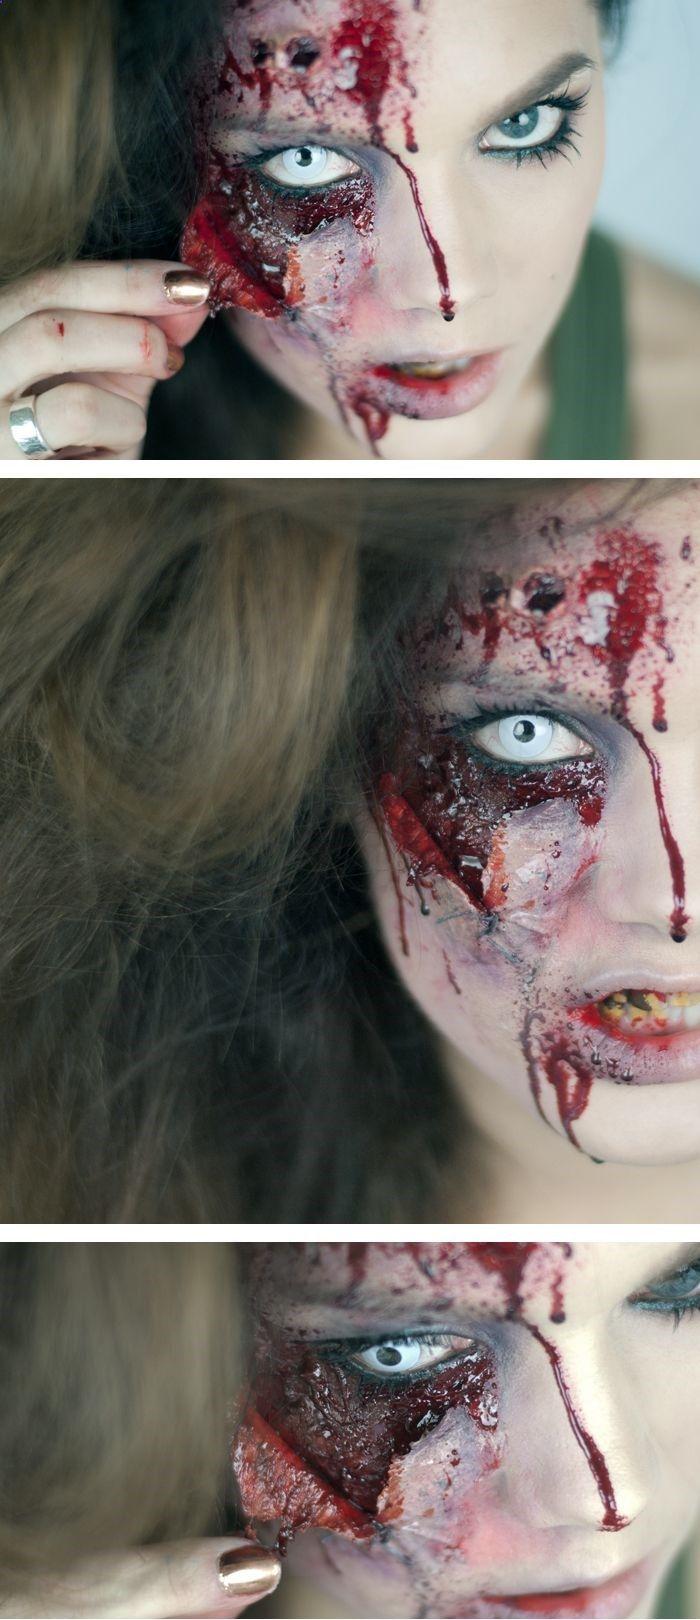 Halloweenmakeup: Peeled of skin! (Varnar känsliga tittare)